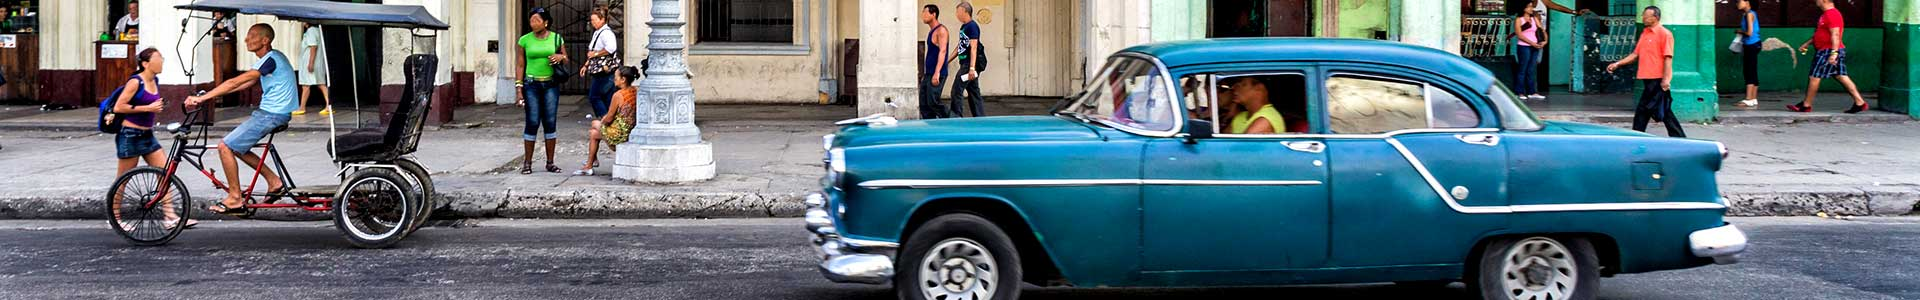 Voyage à Cuba - TUI